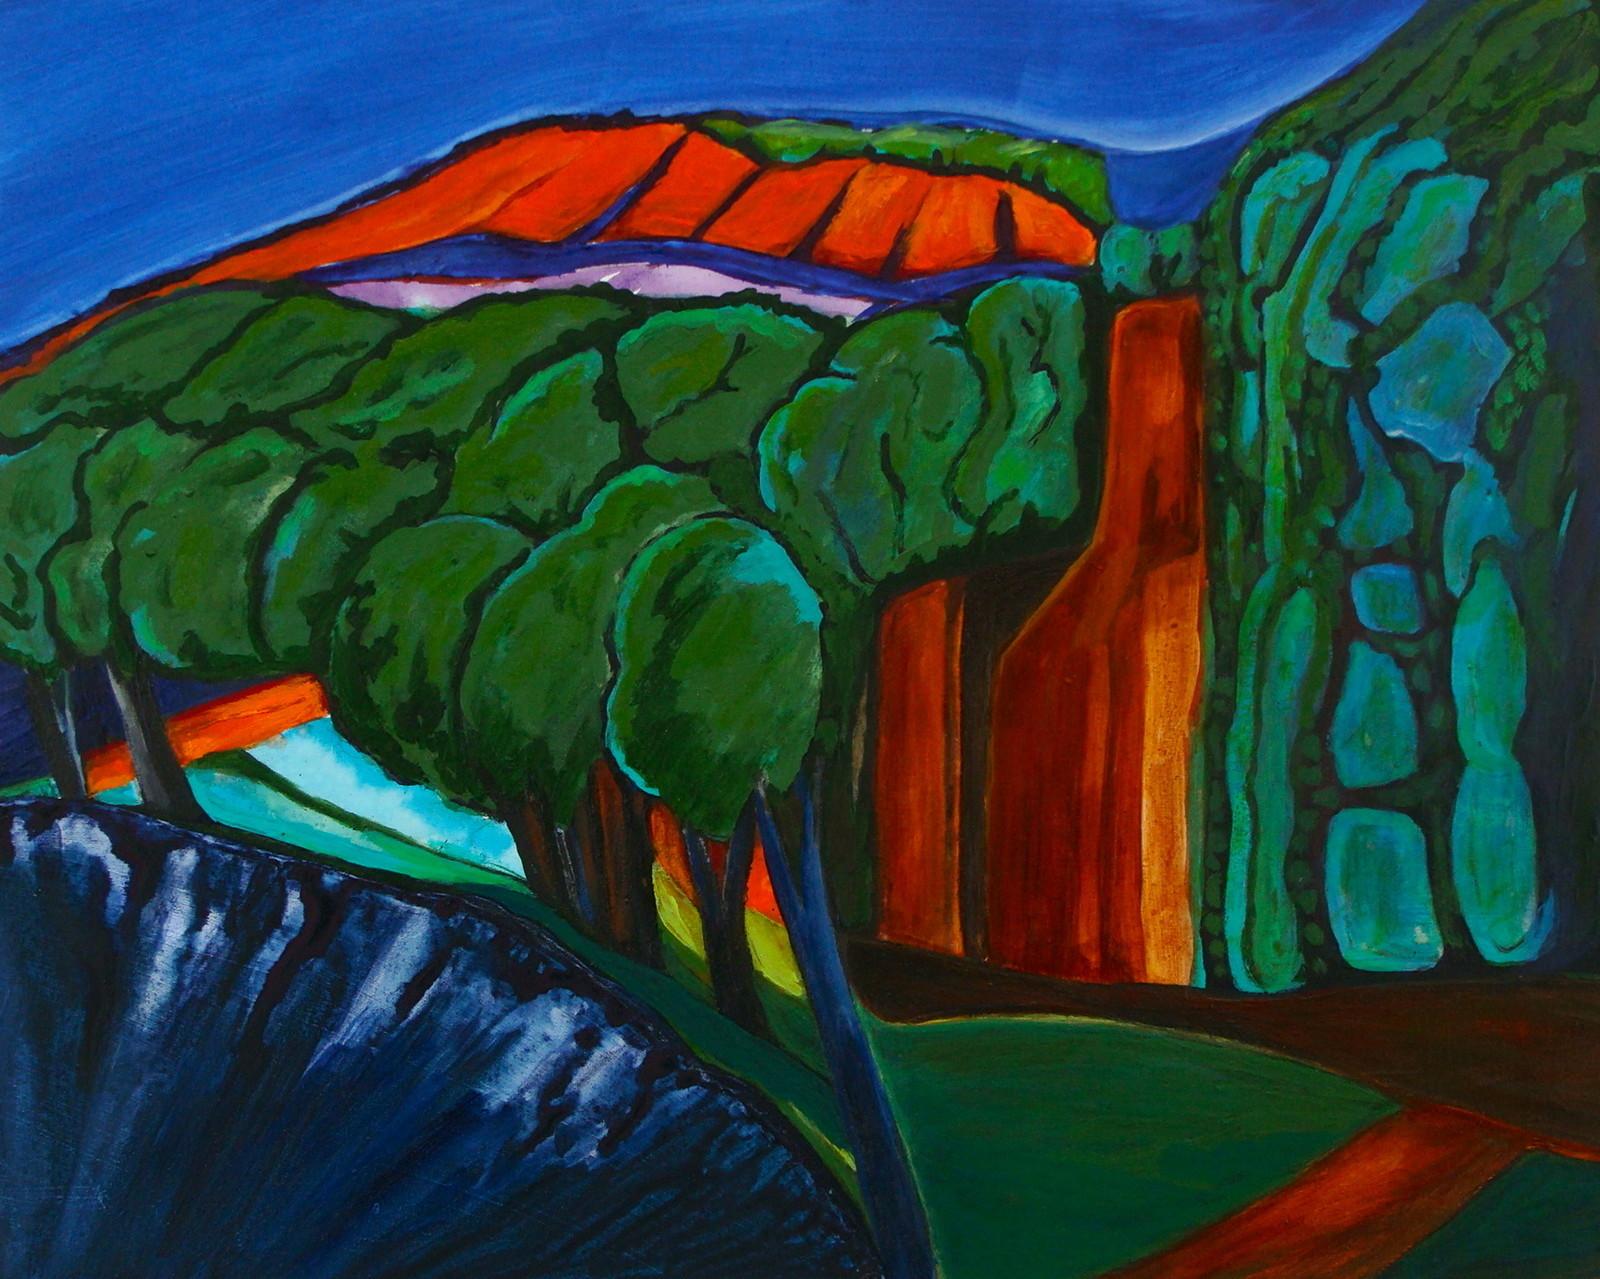 Sunset's Glow, oil on canvas, 20 x 16, 2014